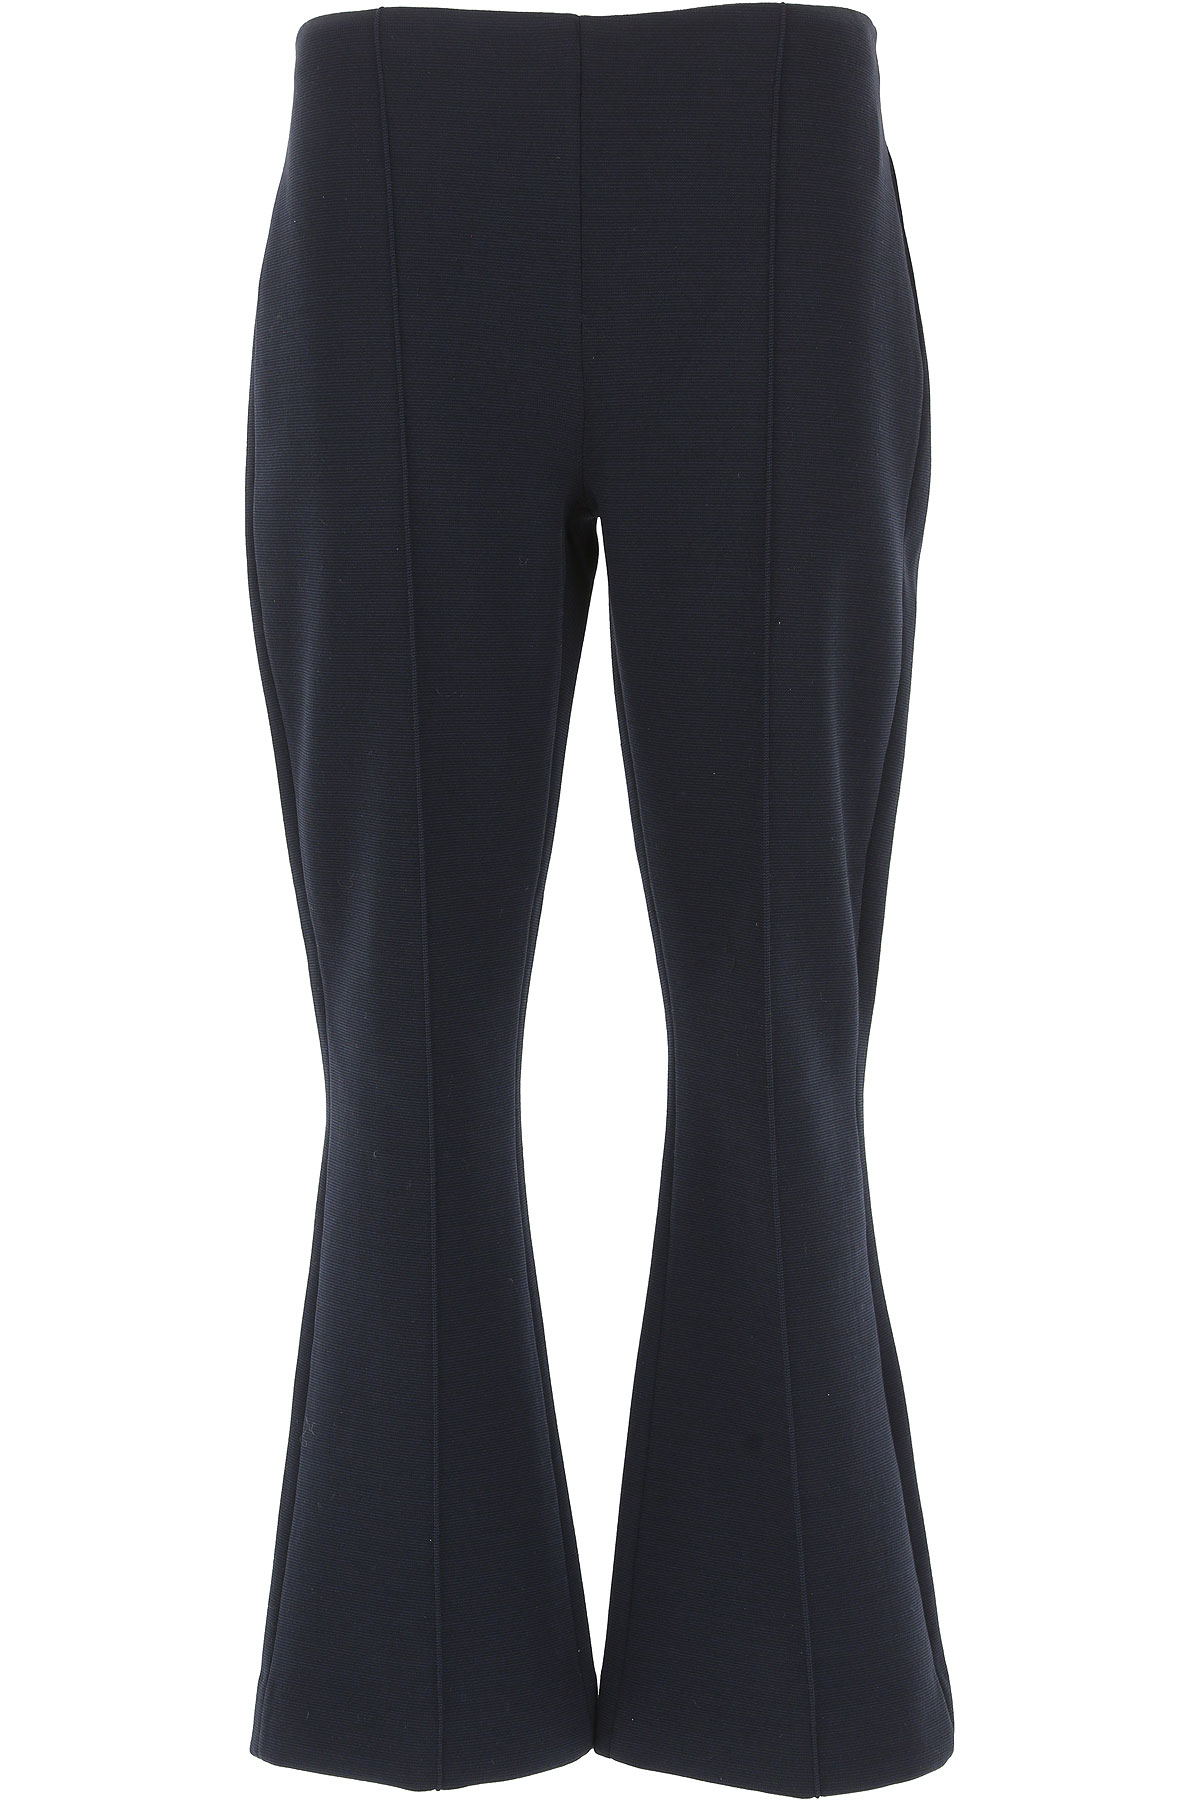 Image of Sonia Rykiel Pants for Women, Midnight, Virgin wool, 2017, 10 6 8